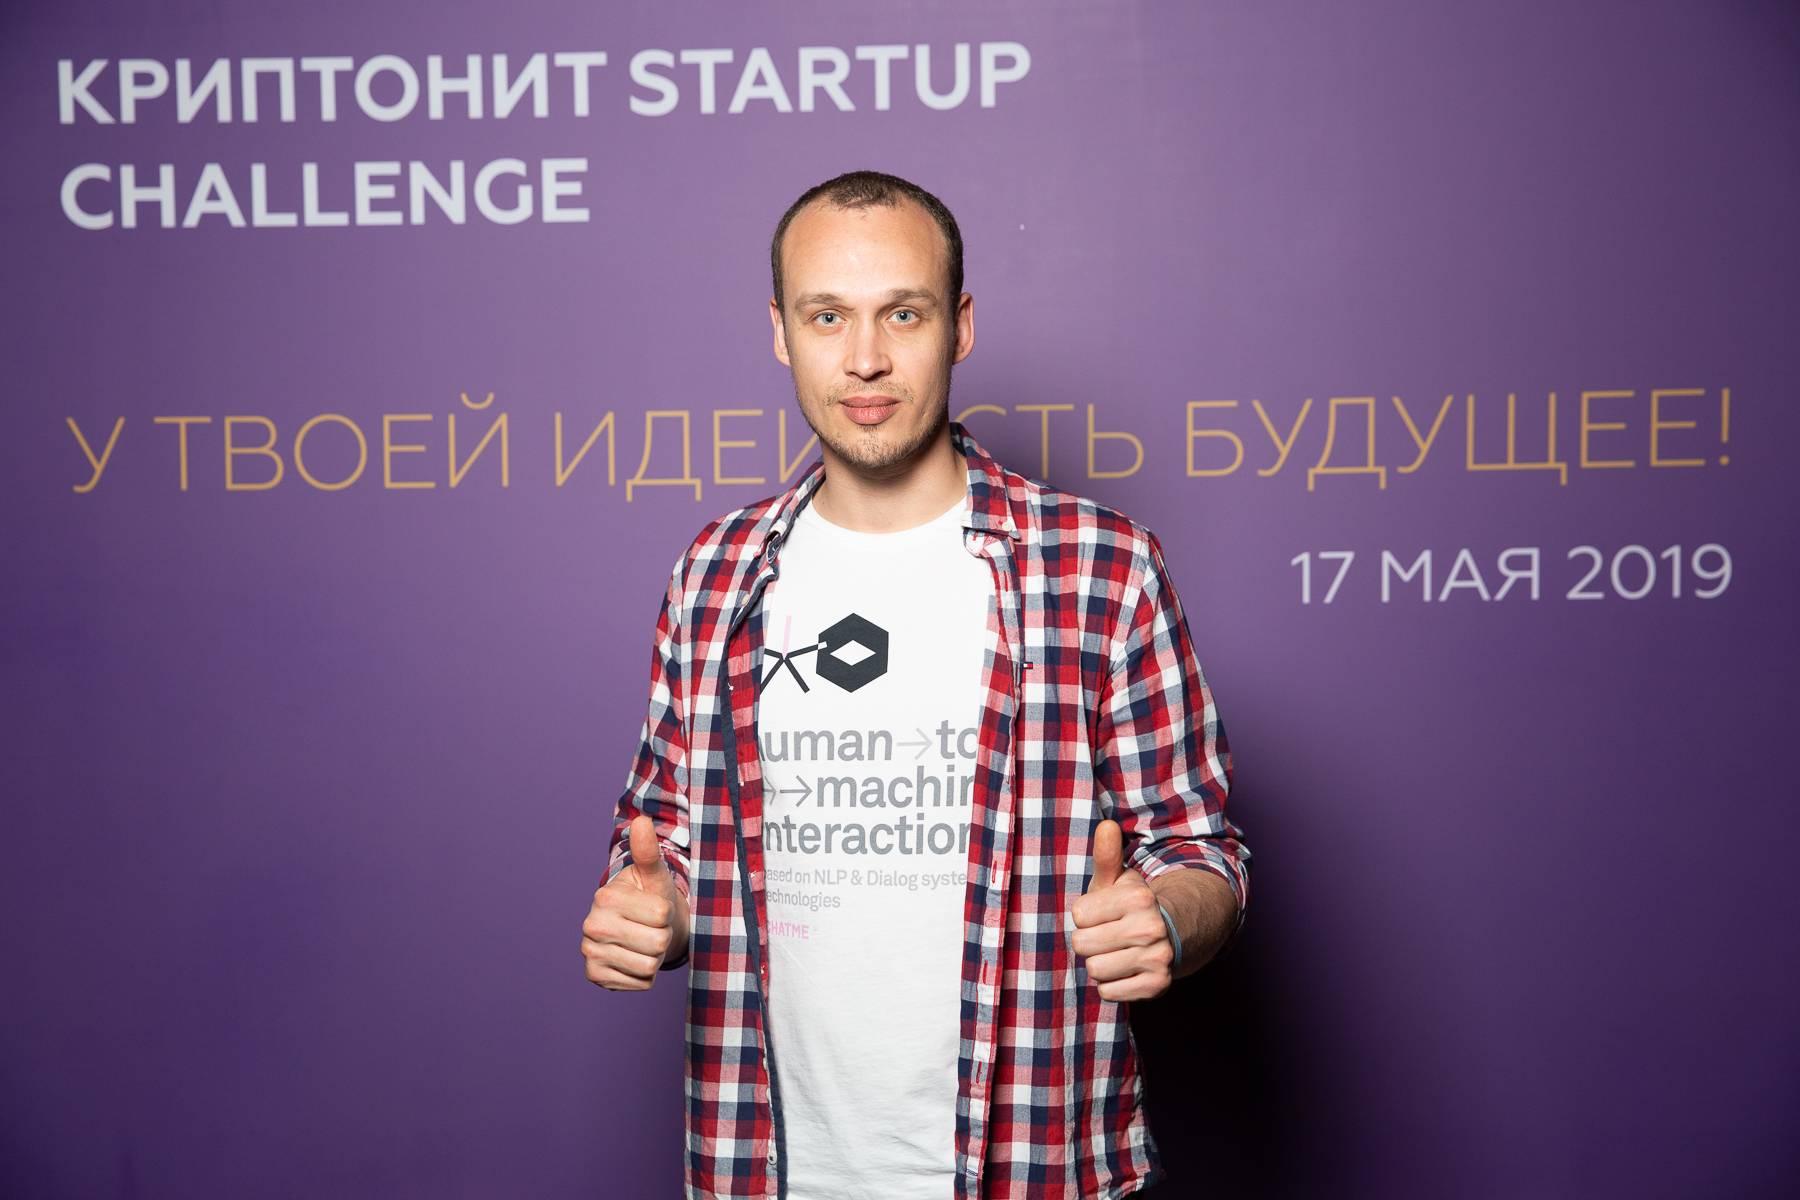 Chatme.ai: Сергей Шлыков